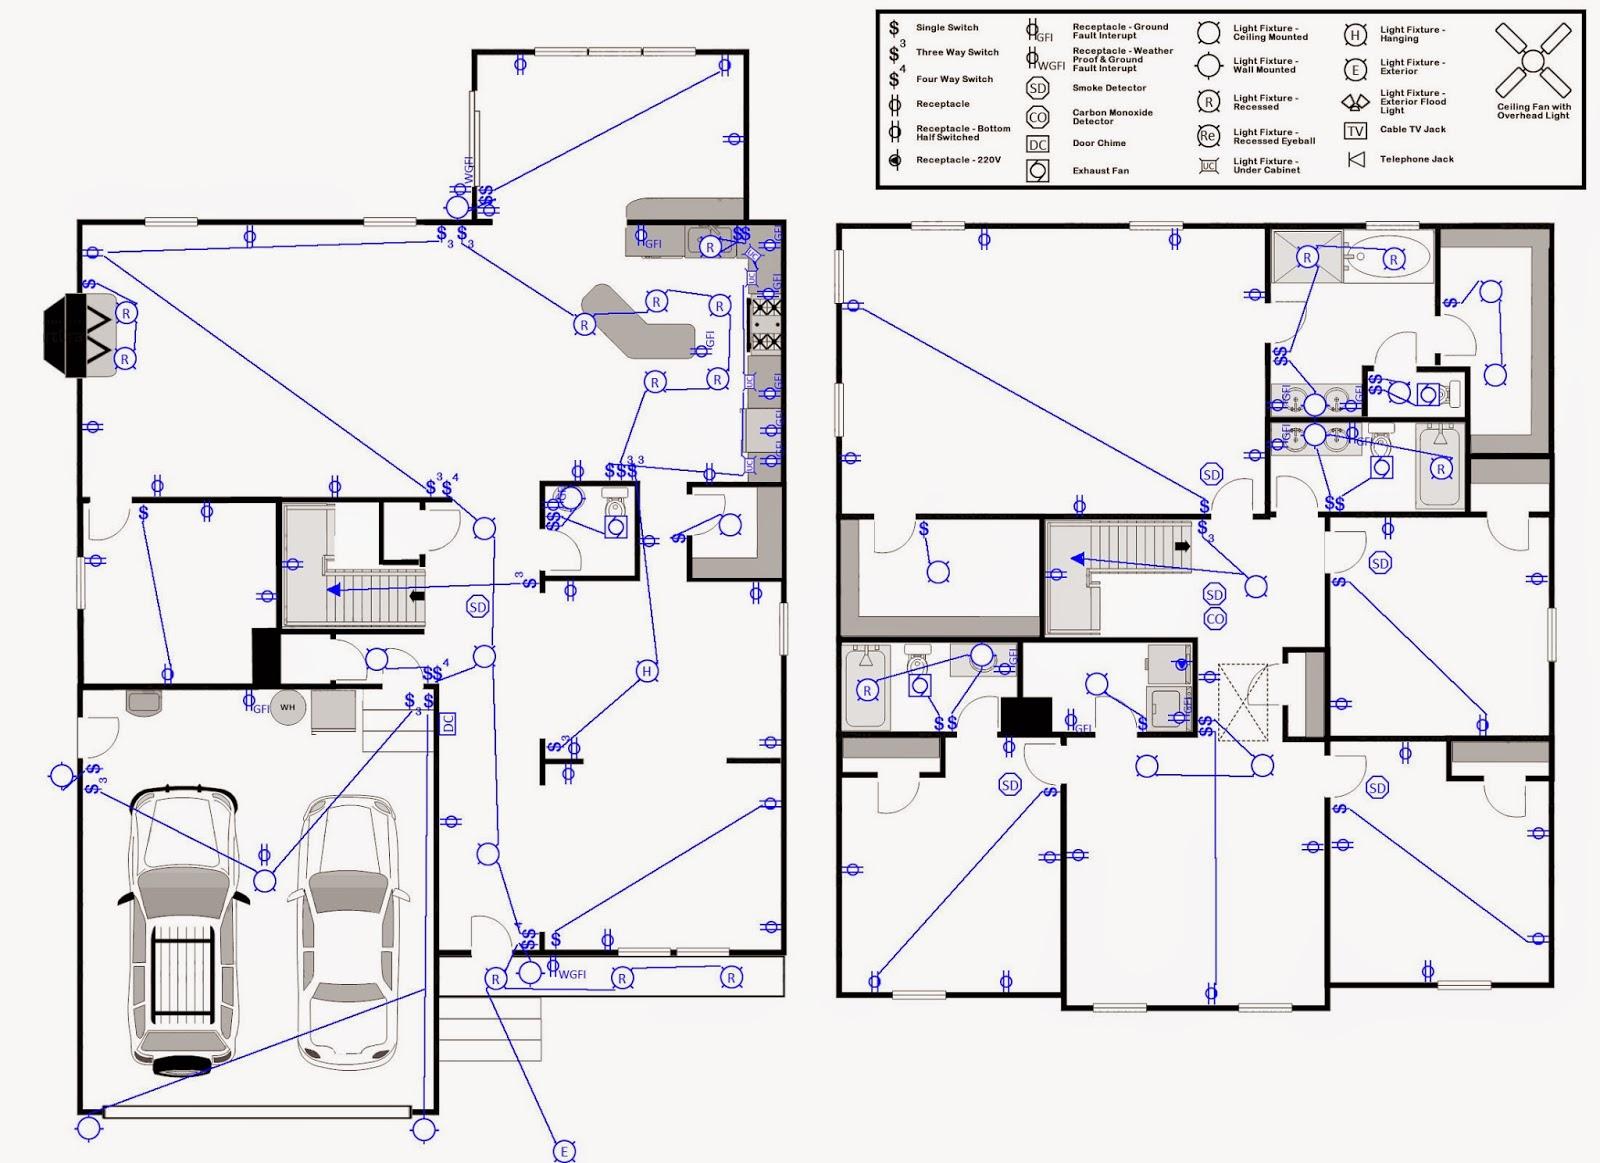 medium resolution of ceiling fan wiring diagram of rough wiring library ceiling fan wiring diagram of rough